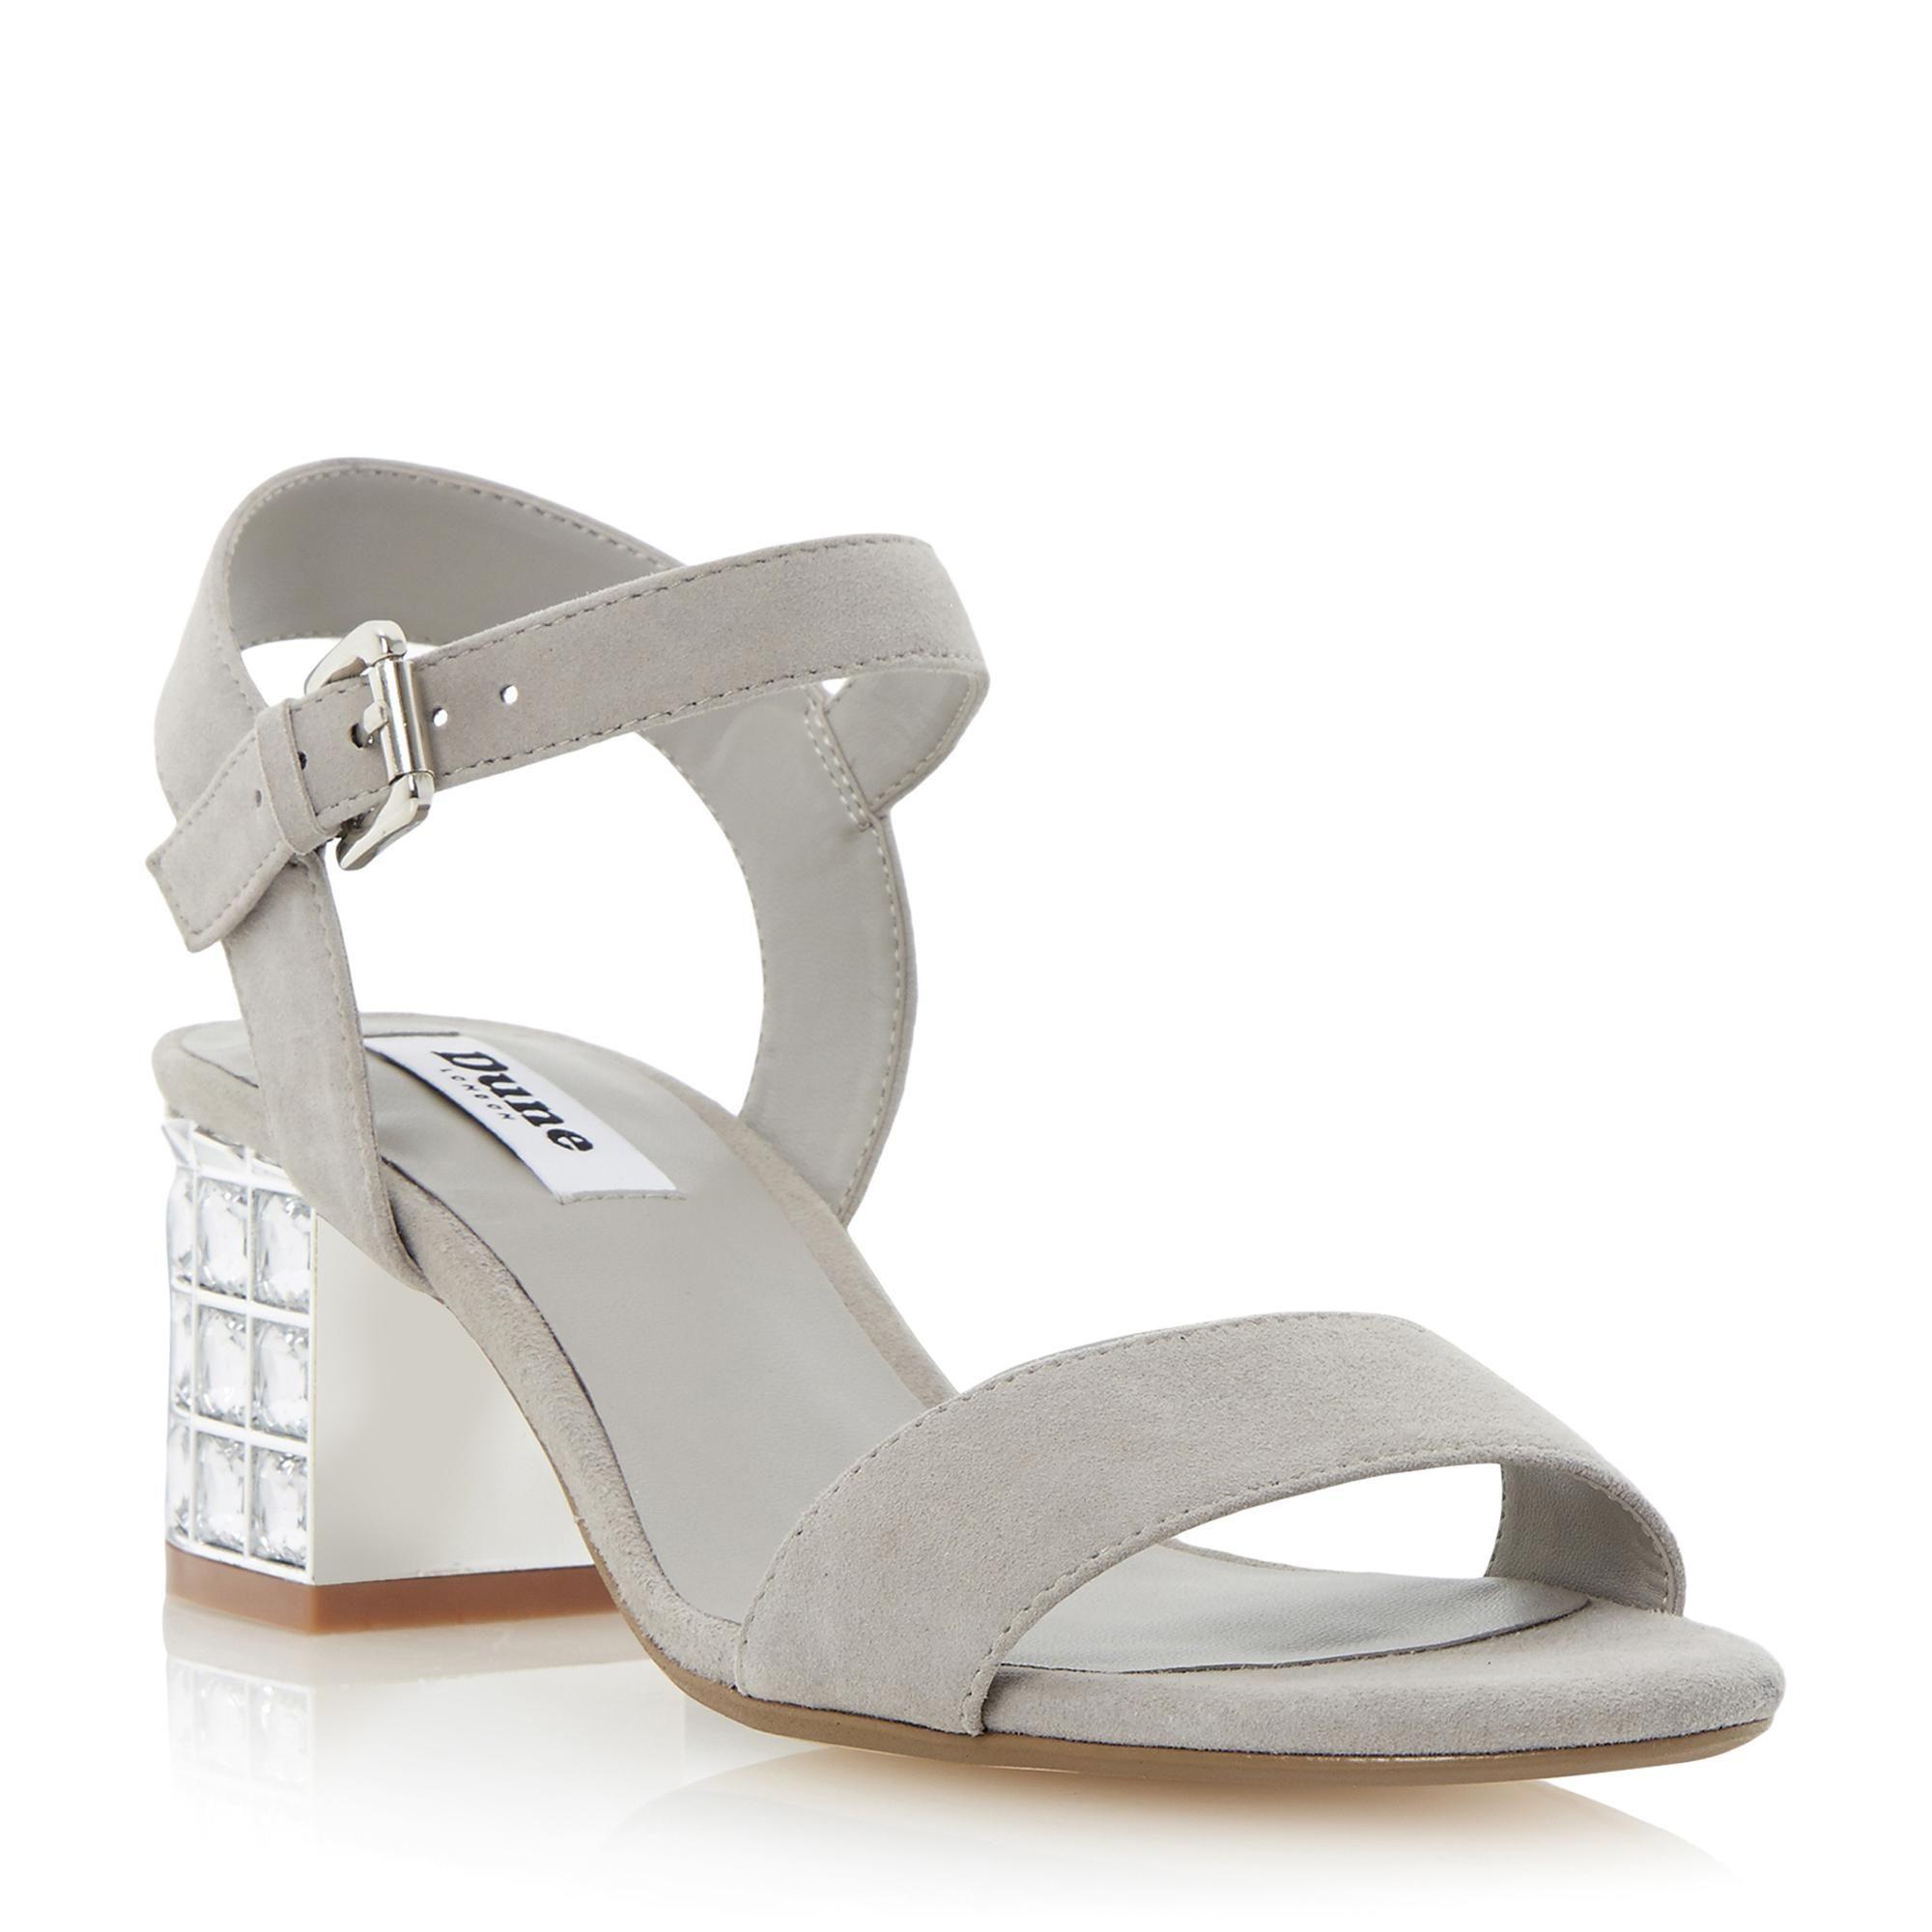 846ca7e44fa6 DUNE LADIES HARAH - Jewelled Block Heel Sandal - grey